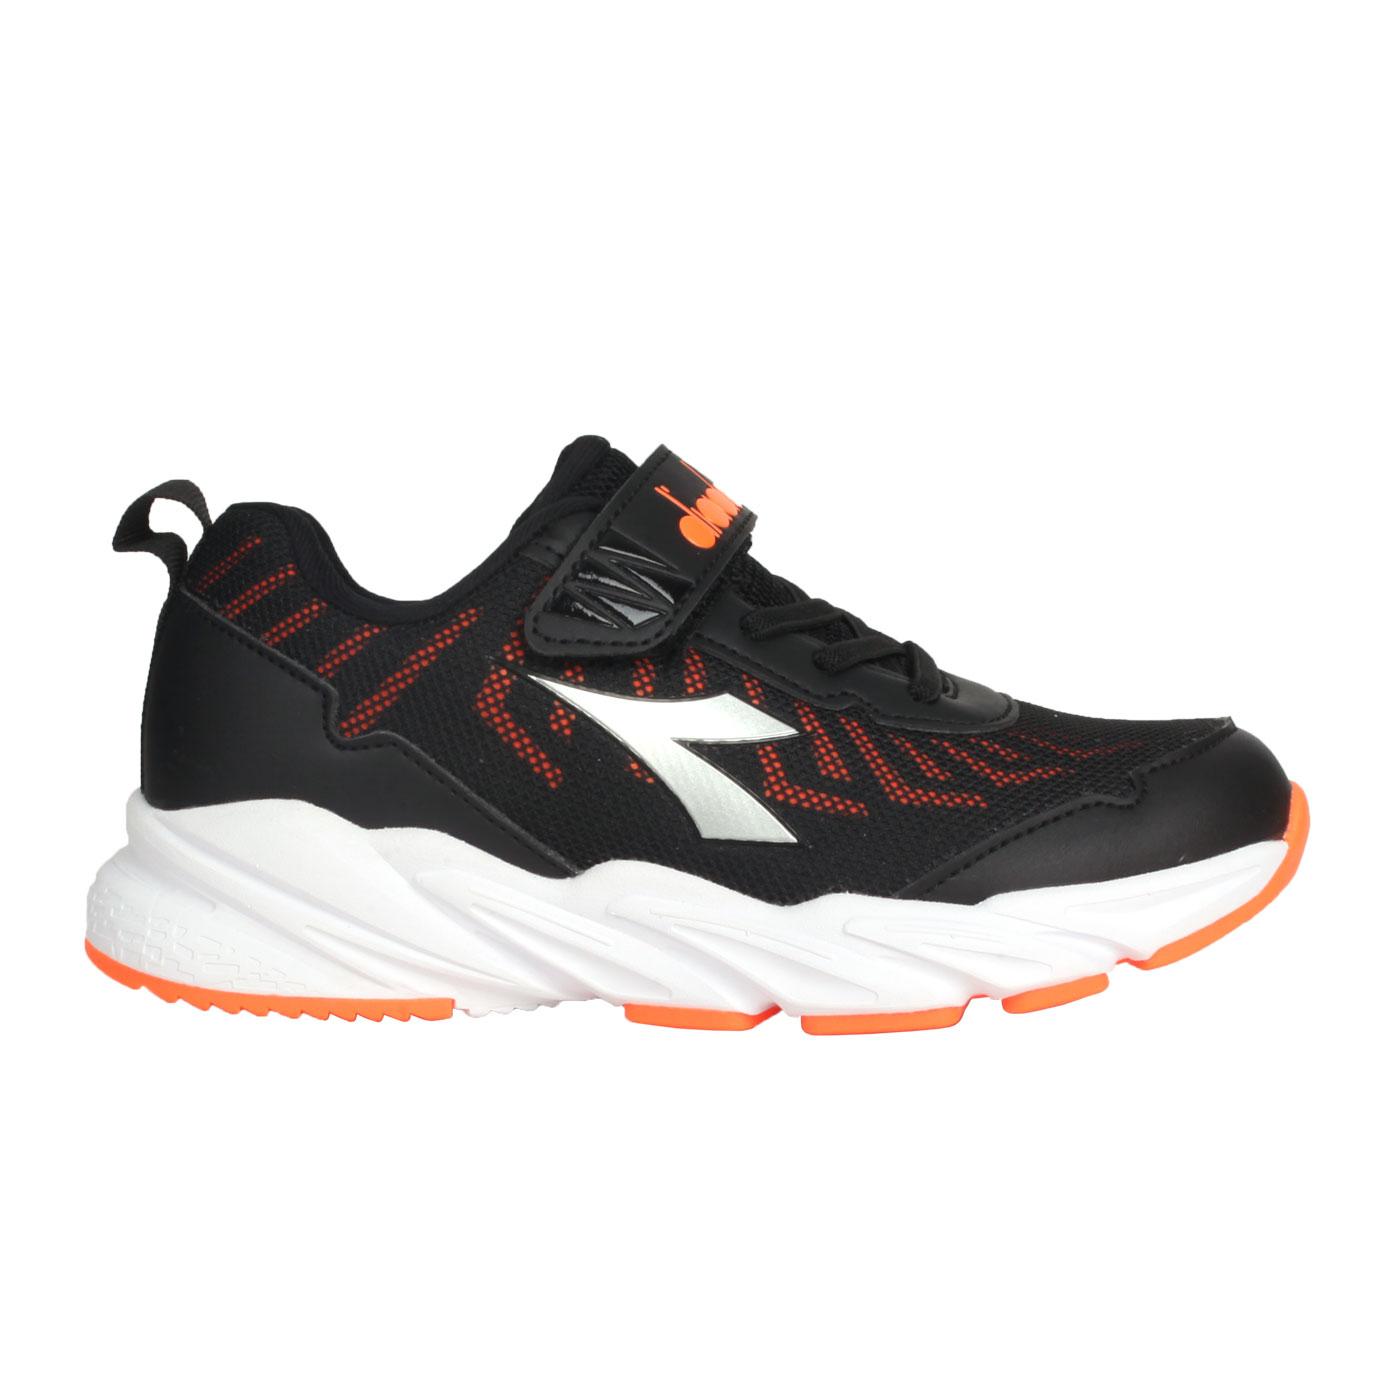 DIADORA 中童輕量慢跑鞋-超寬楦 DA13011 - 黑銀橘